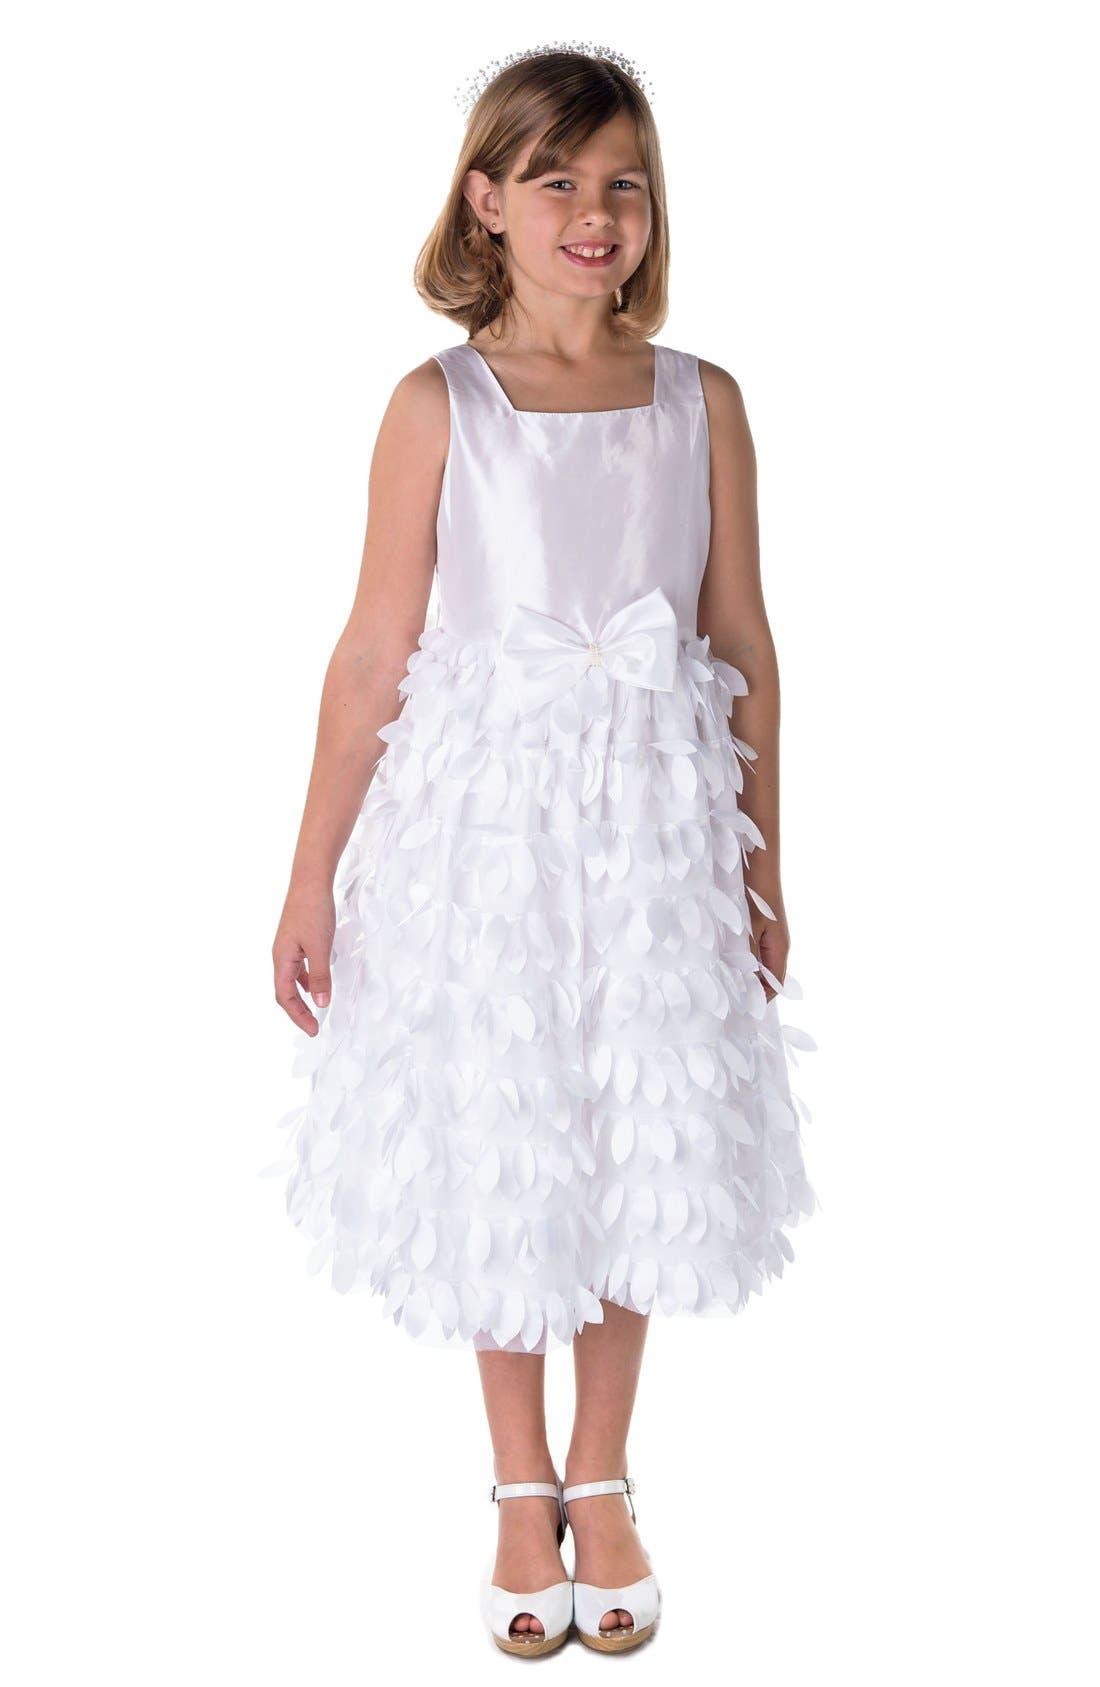 'Petal' Taffeta Flower Girl Dress,                         Main,                         color, 100